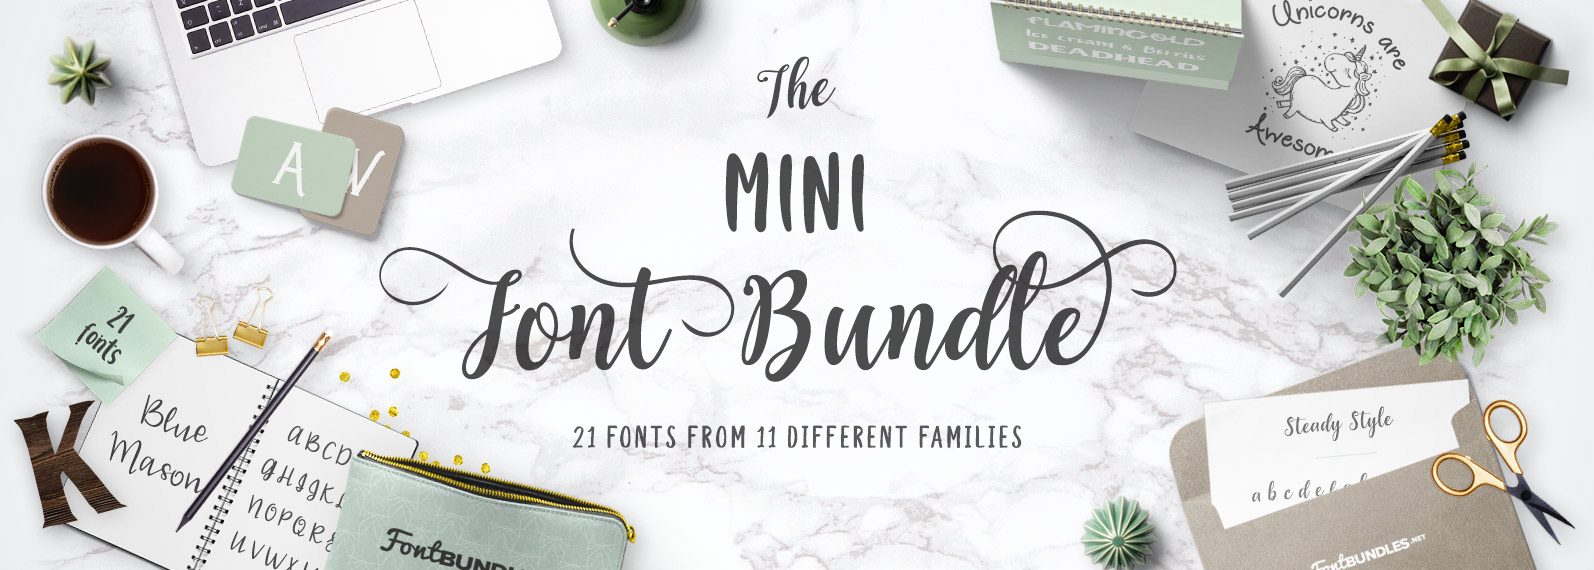 The Mini Font Bundle Cover